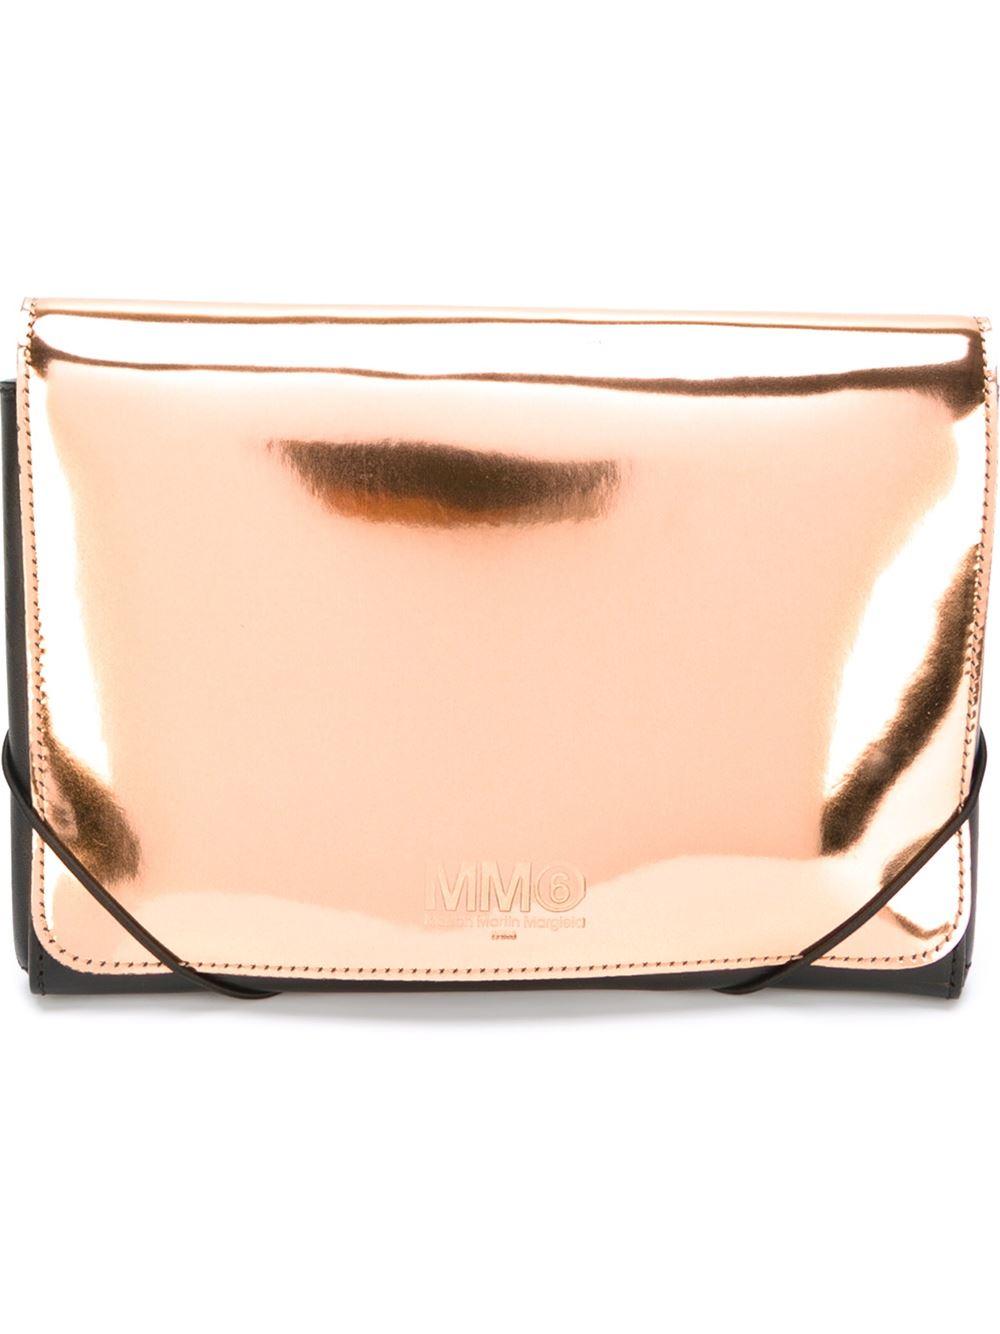 Mm6 by maison martin margiela high shine clutch in gold for Mm6 maison martin margiela